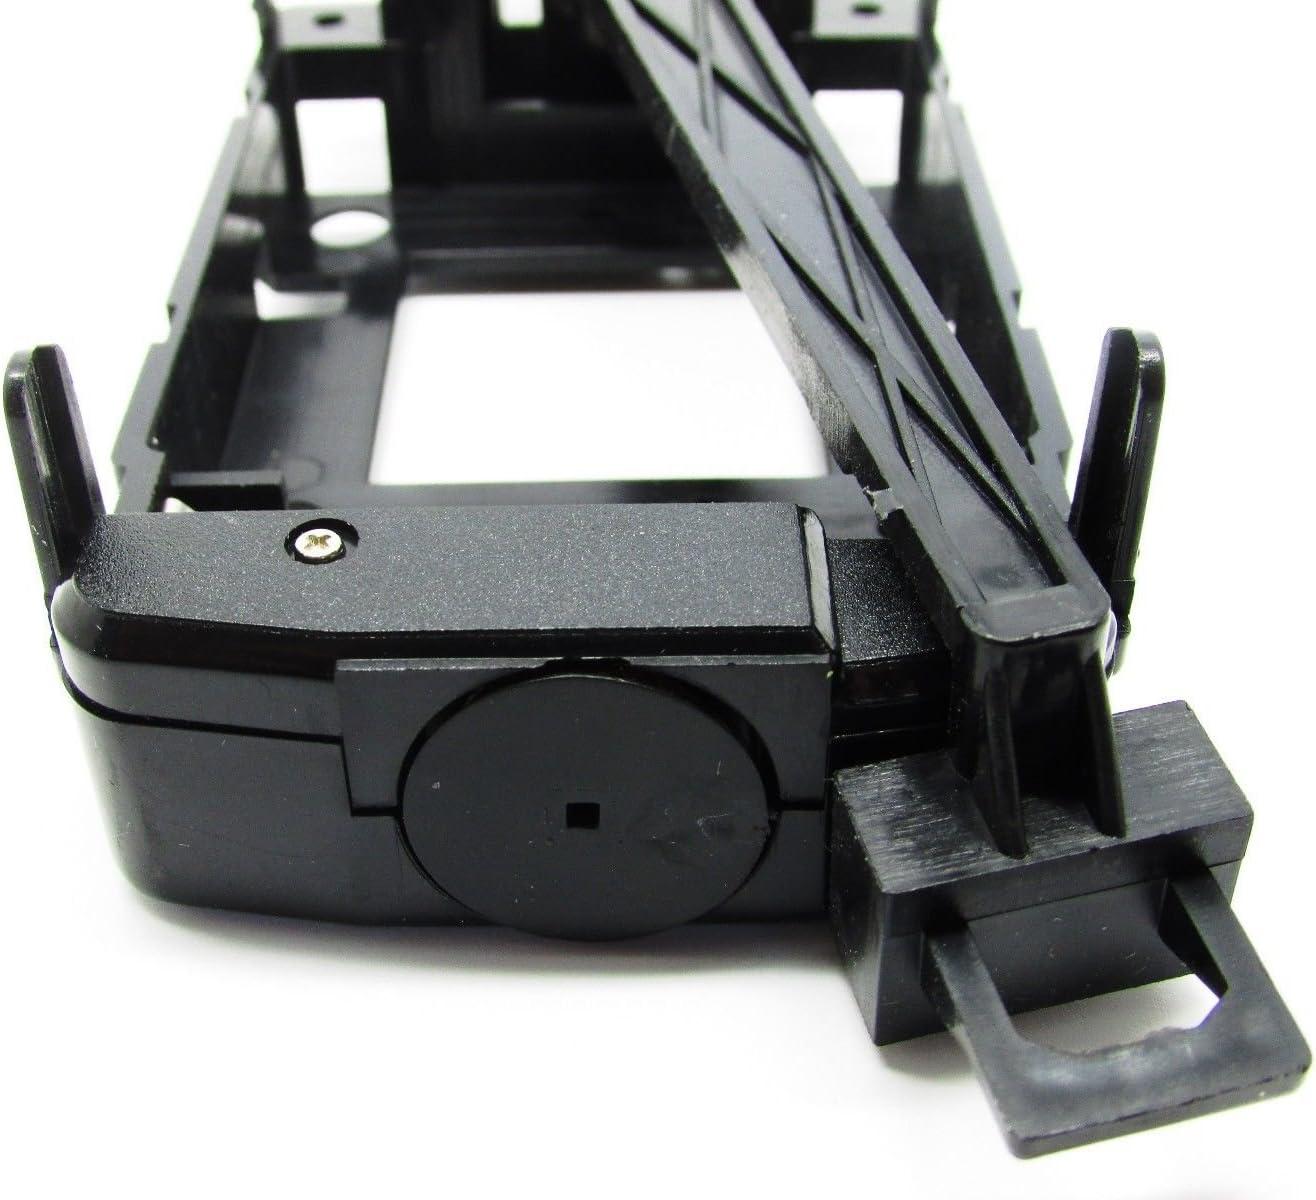 Quartz pendulum drive motor module for all standard hand